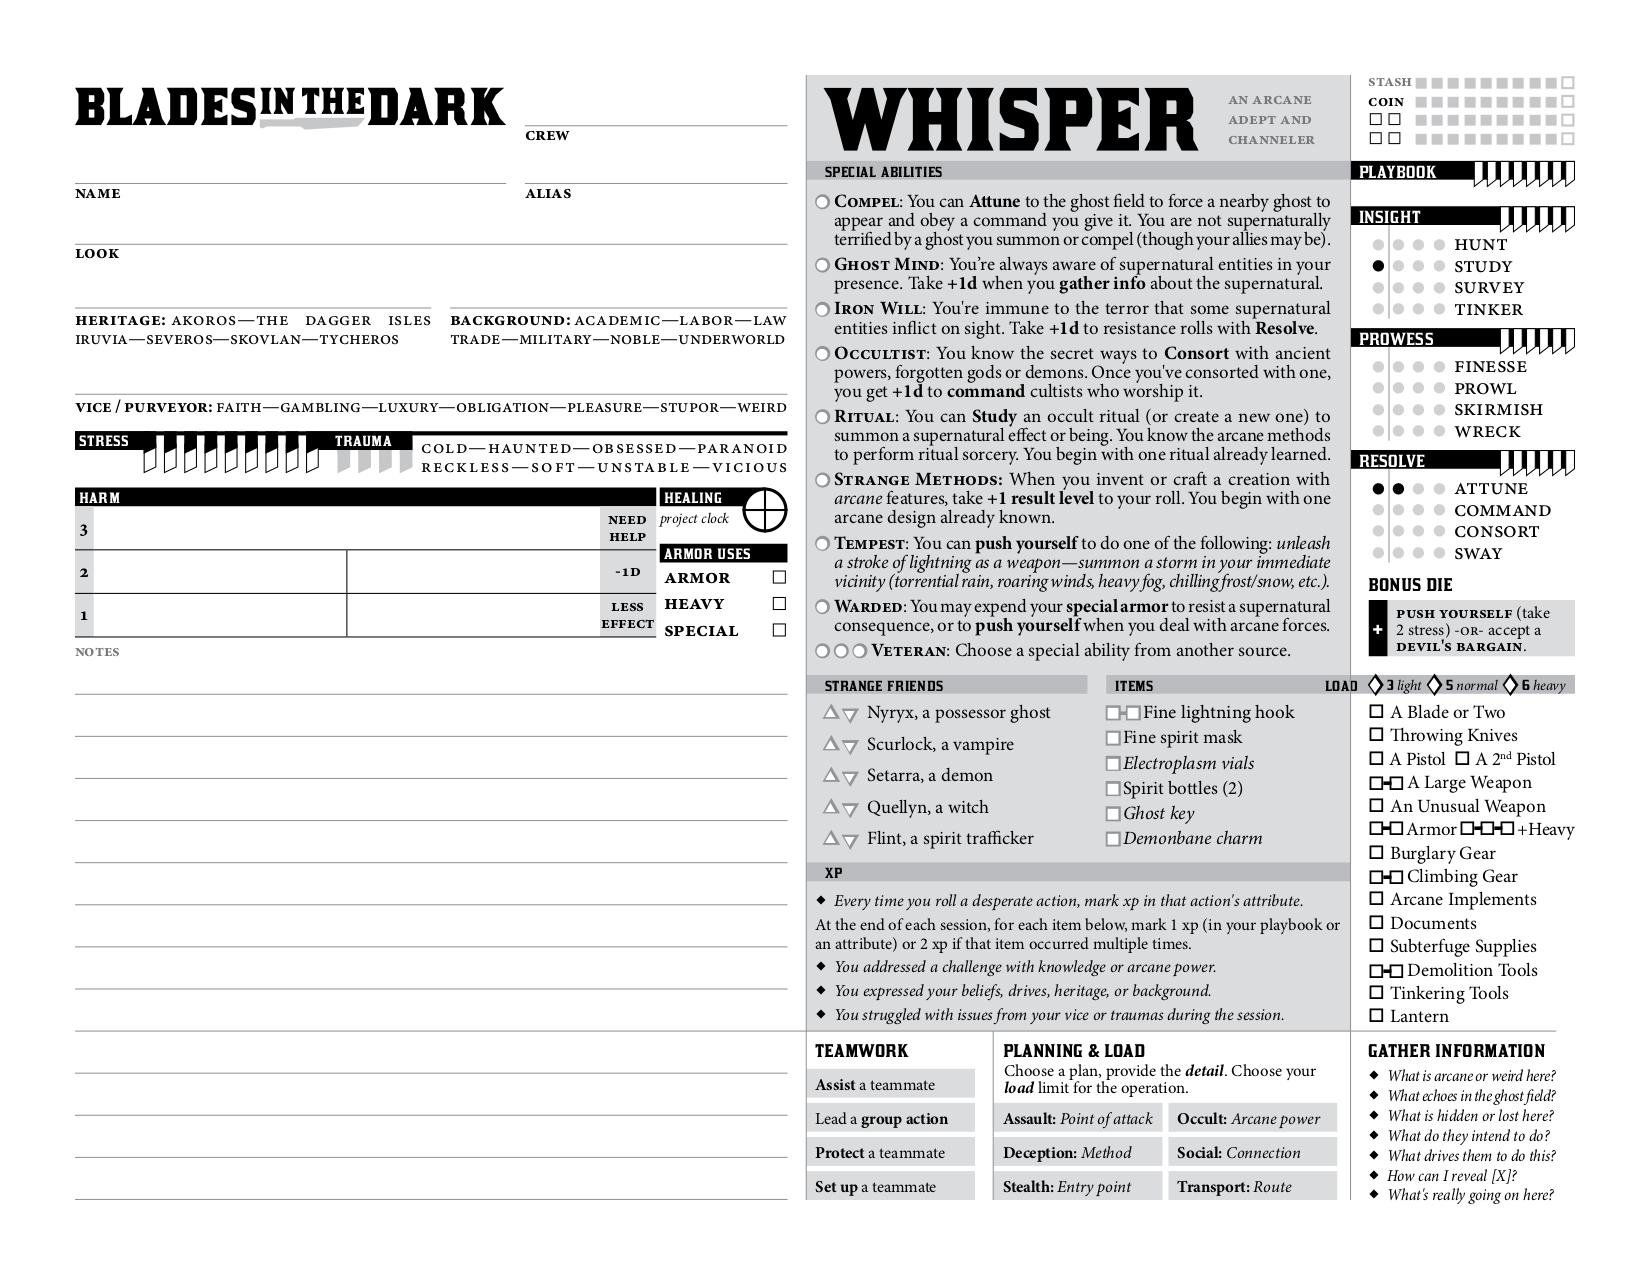 Playbook-Whisper.jpg